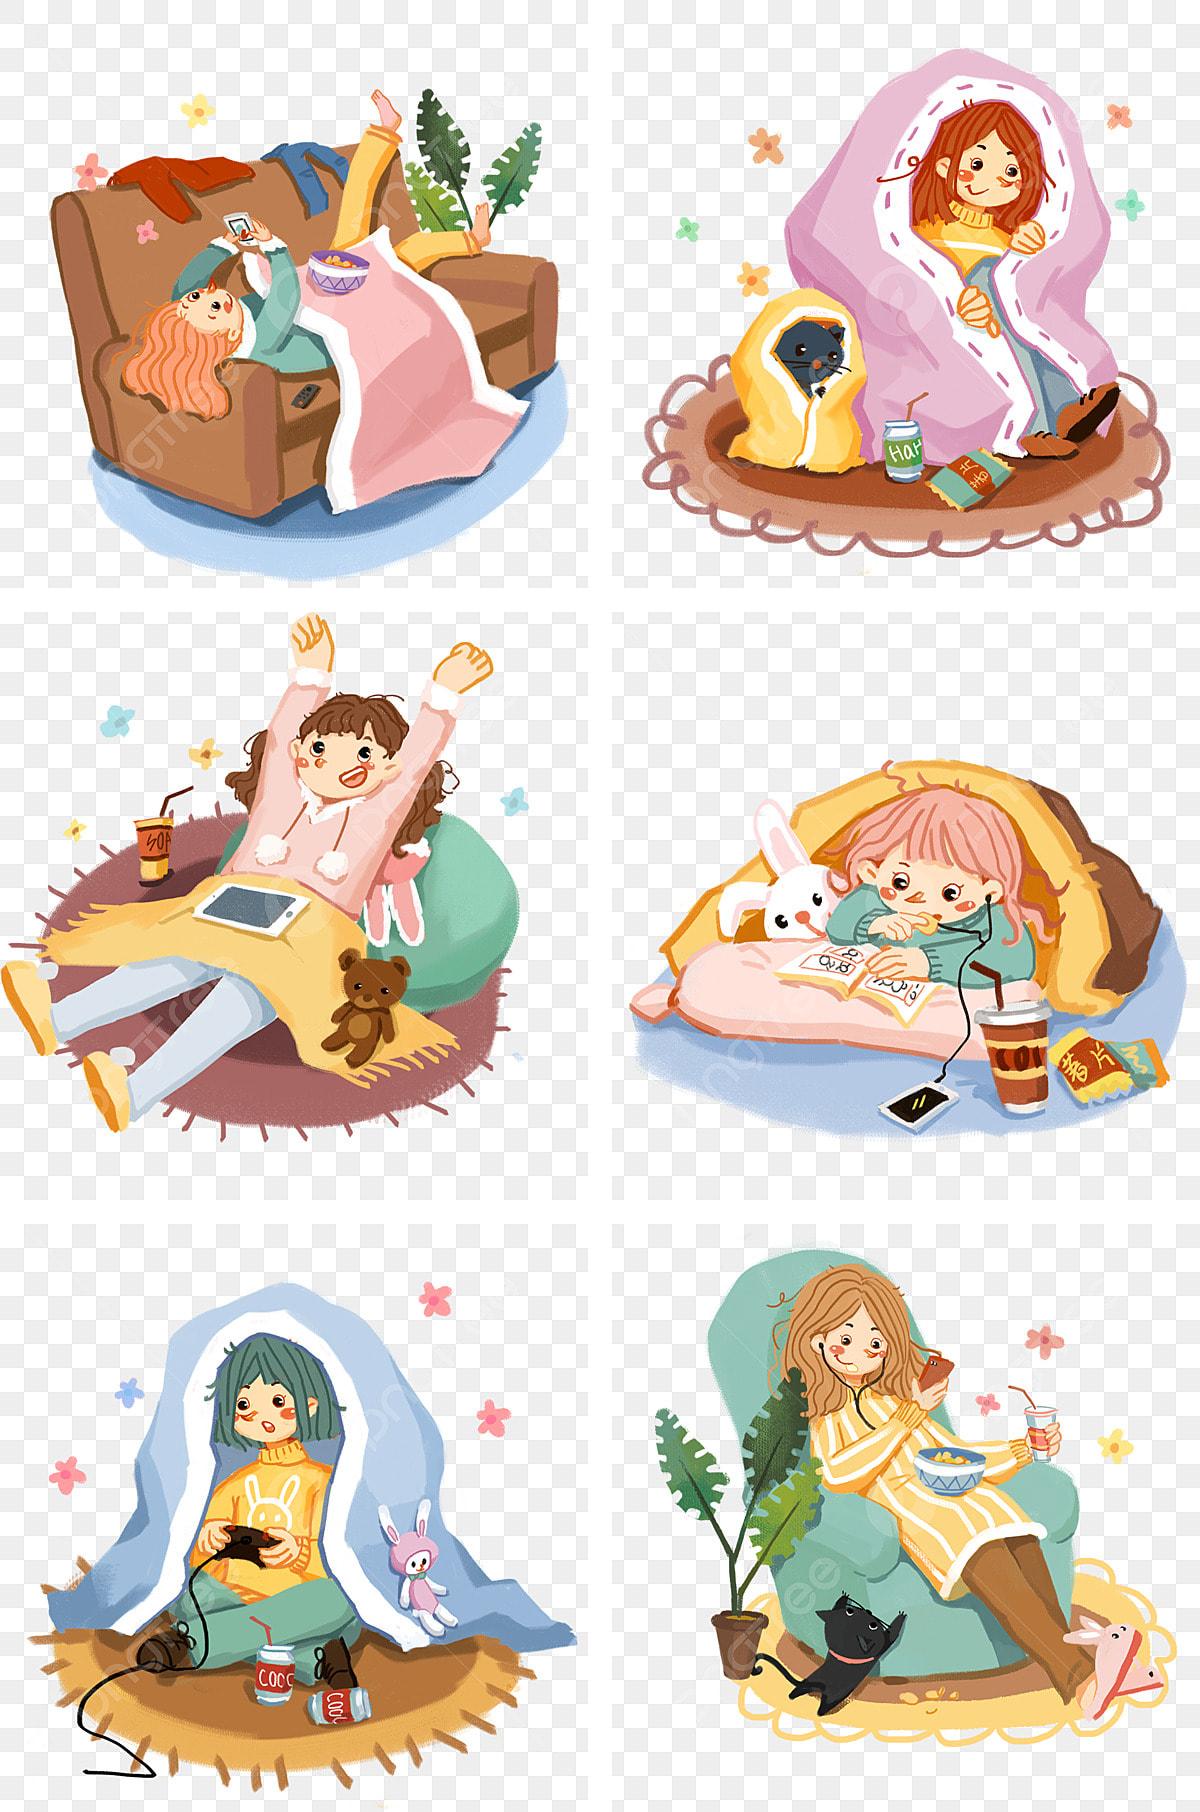 Illustration, Winter warm little house illustration transparent background  PNG clipart | HiClipart